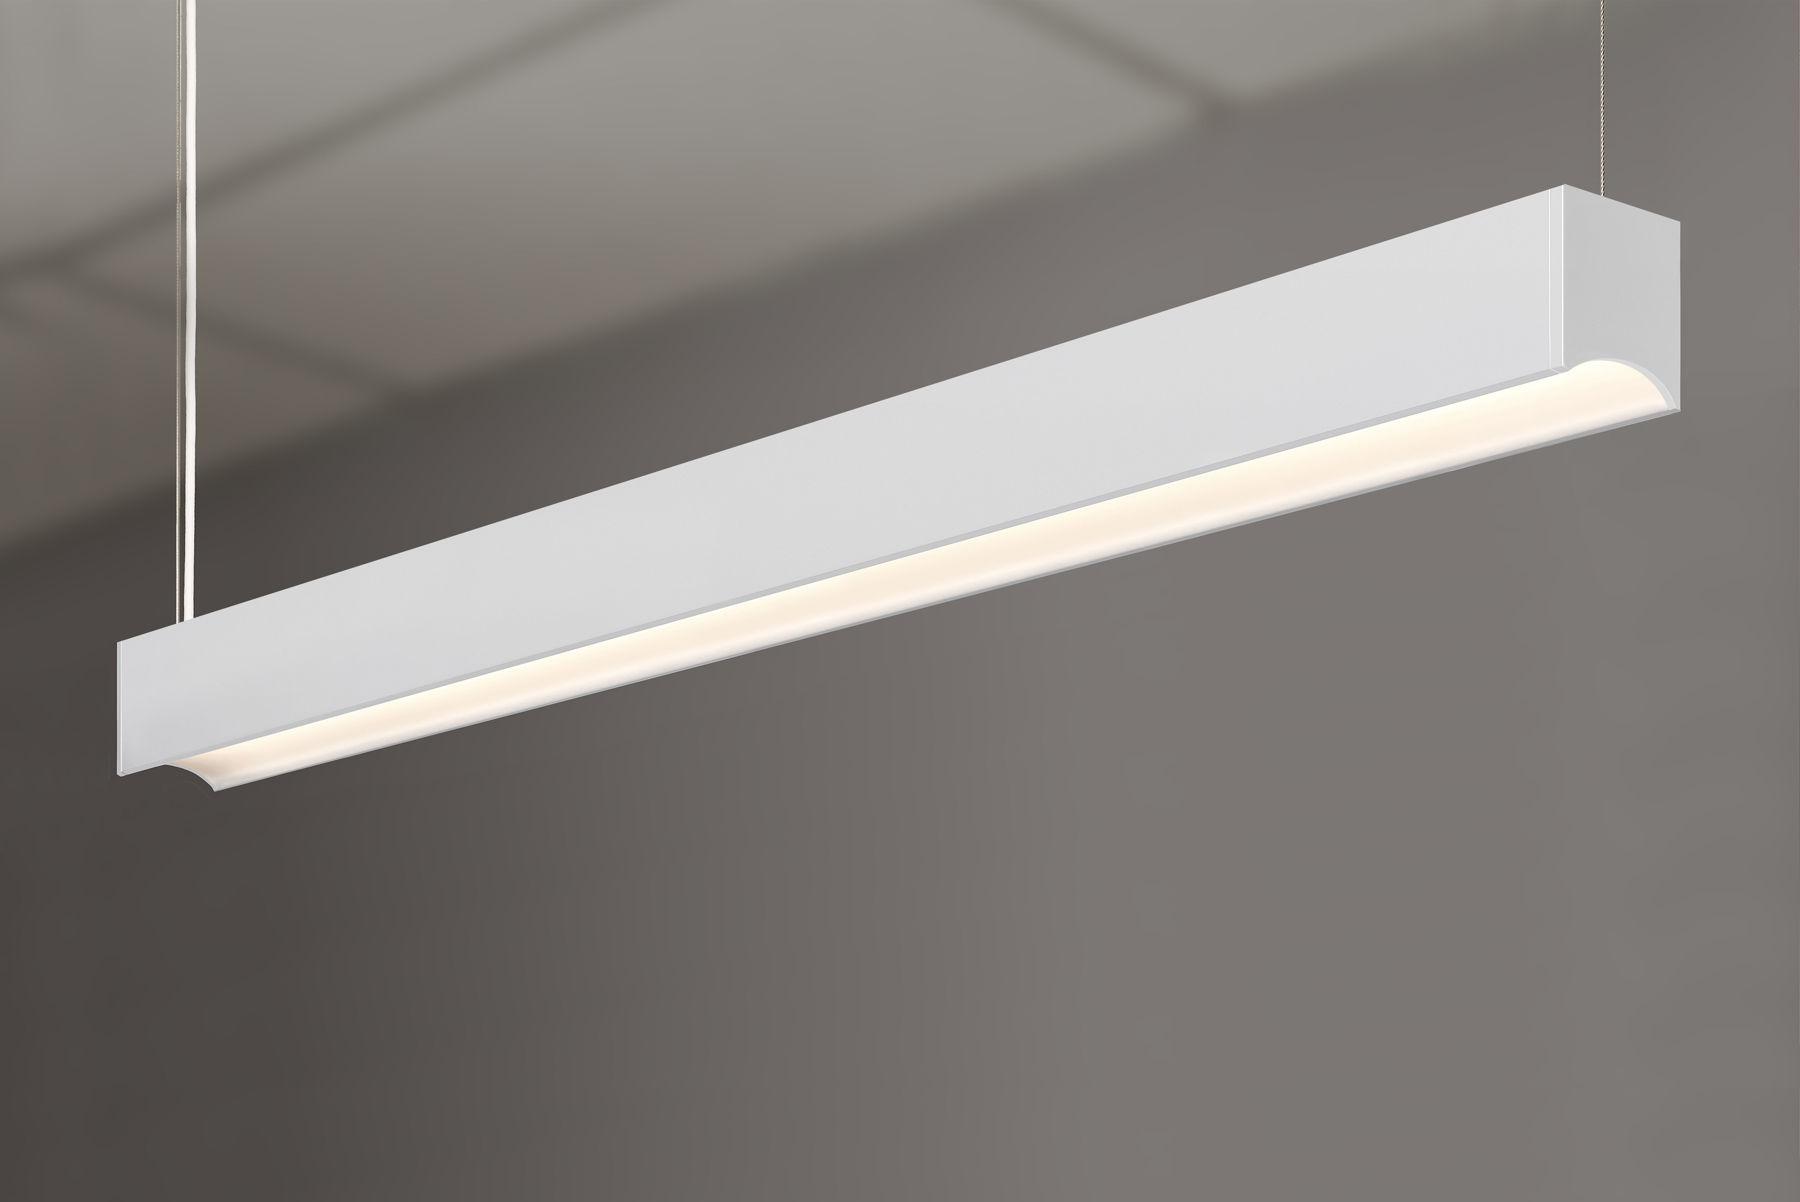 Picture of GB34D2PE-LED-LENSCC.6